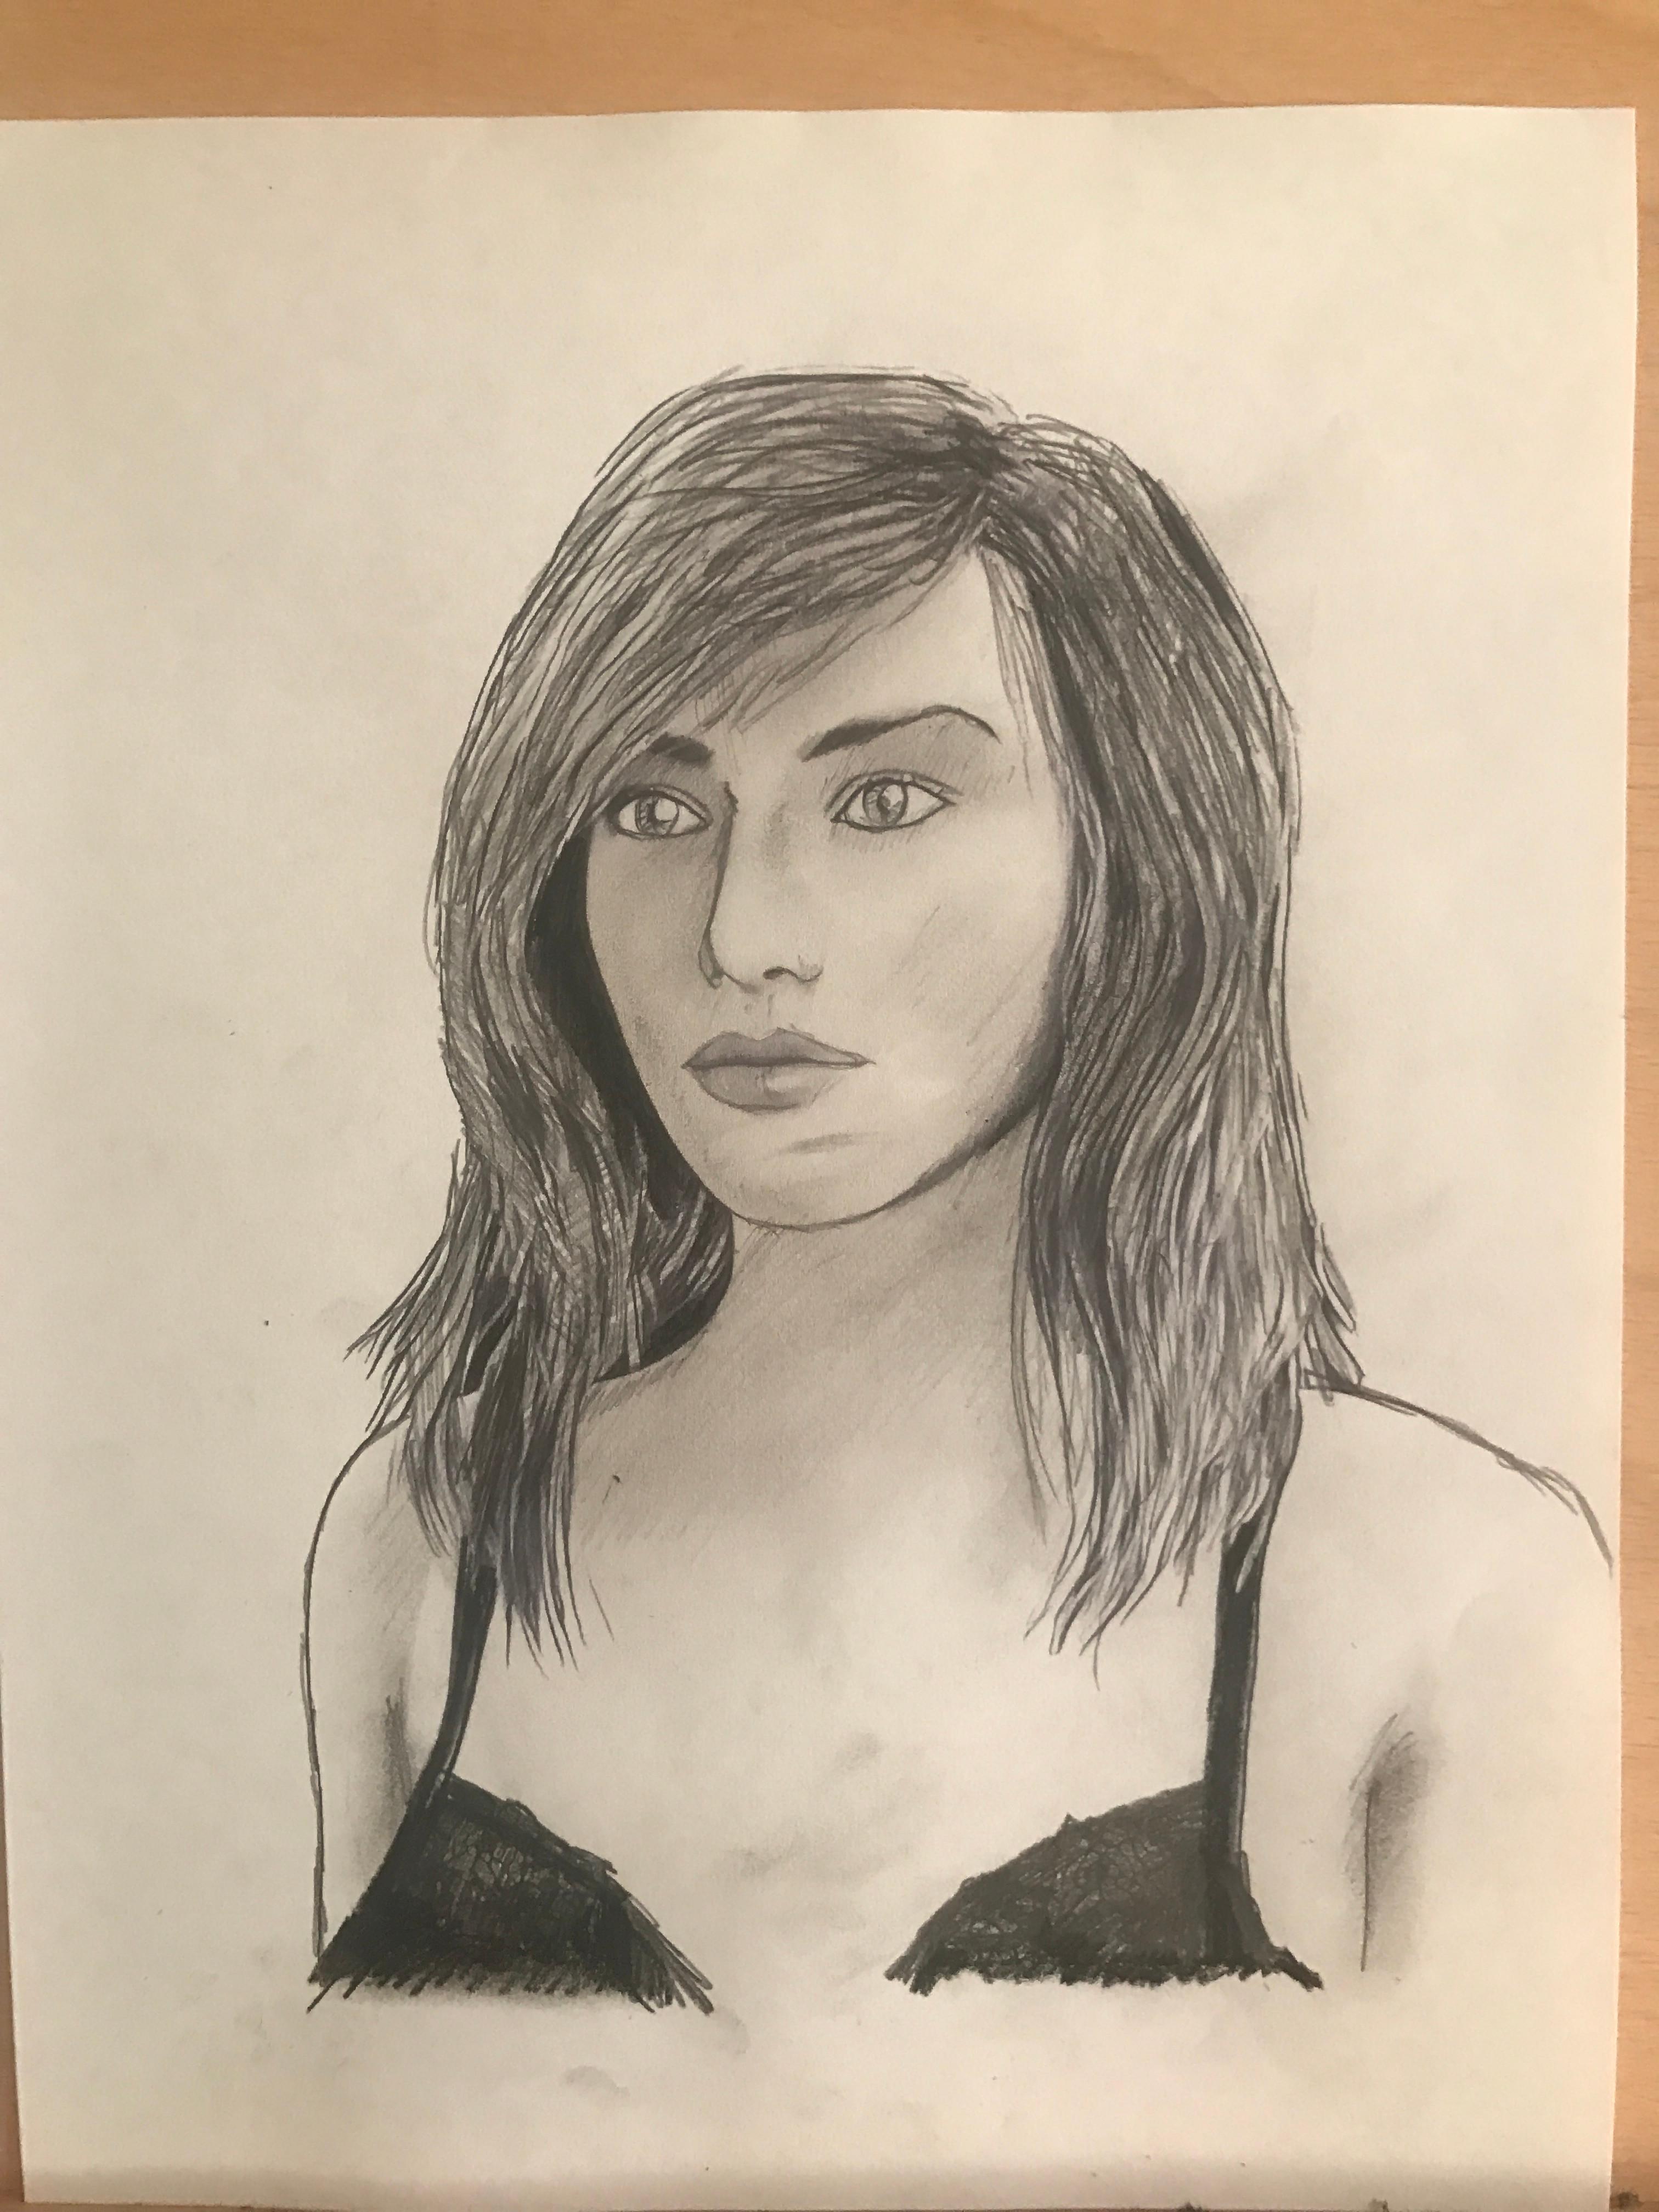 Portrait Study - Initial sketch